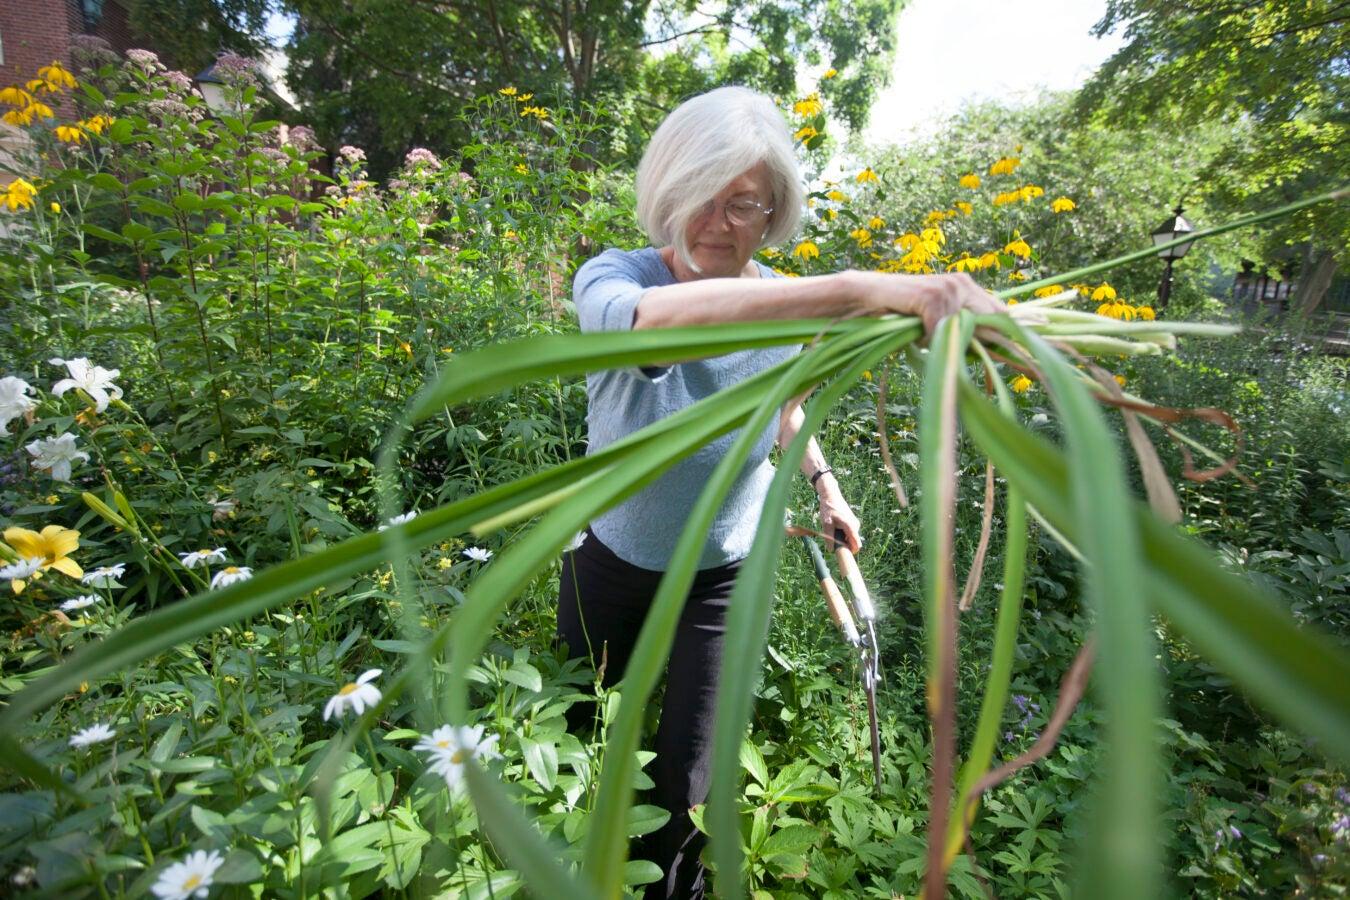 Elizabeth Gray works in the garden. Kris Snibbe/Harvard Staff Photographer